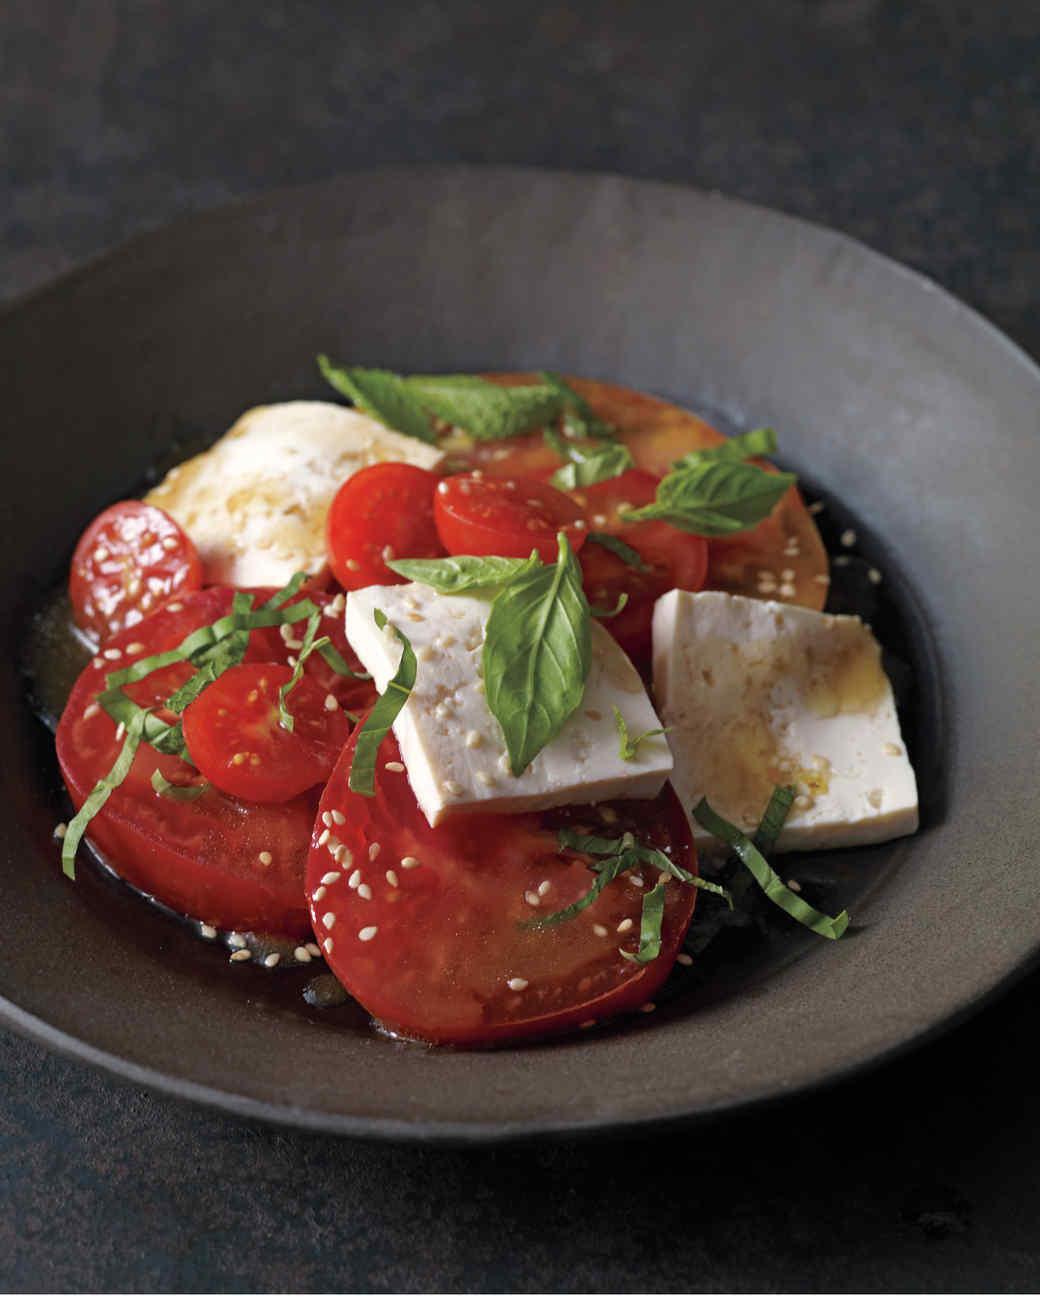 tomato-016-md108876.jpg